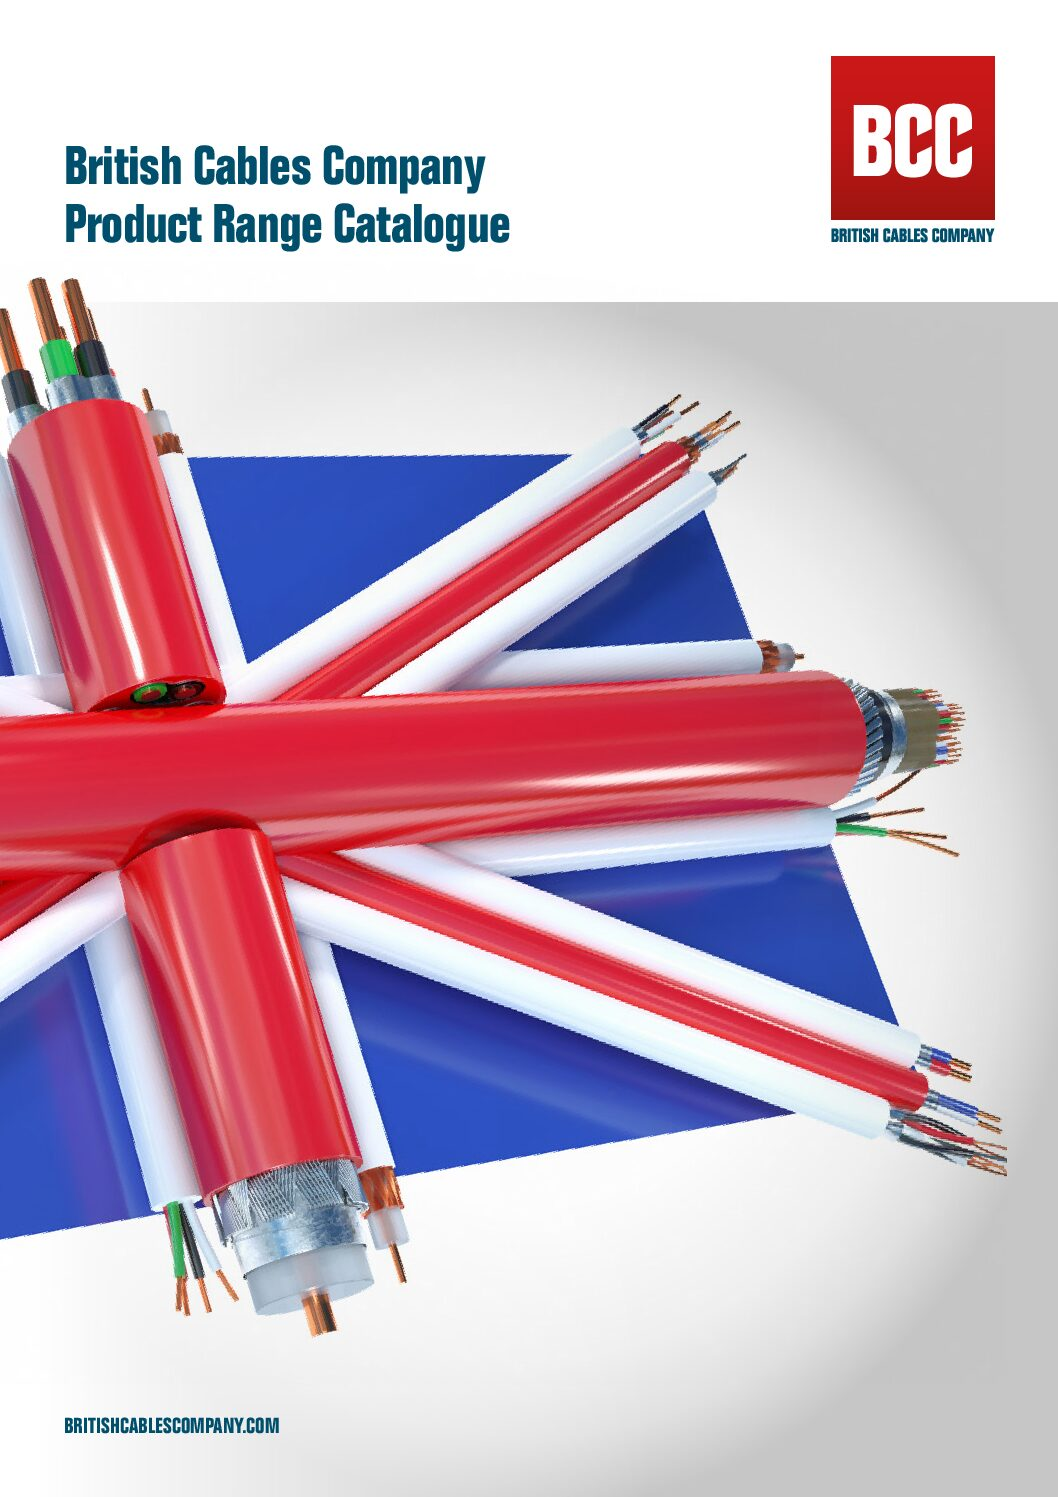 British Cables Company Product Range Catalogue